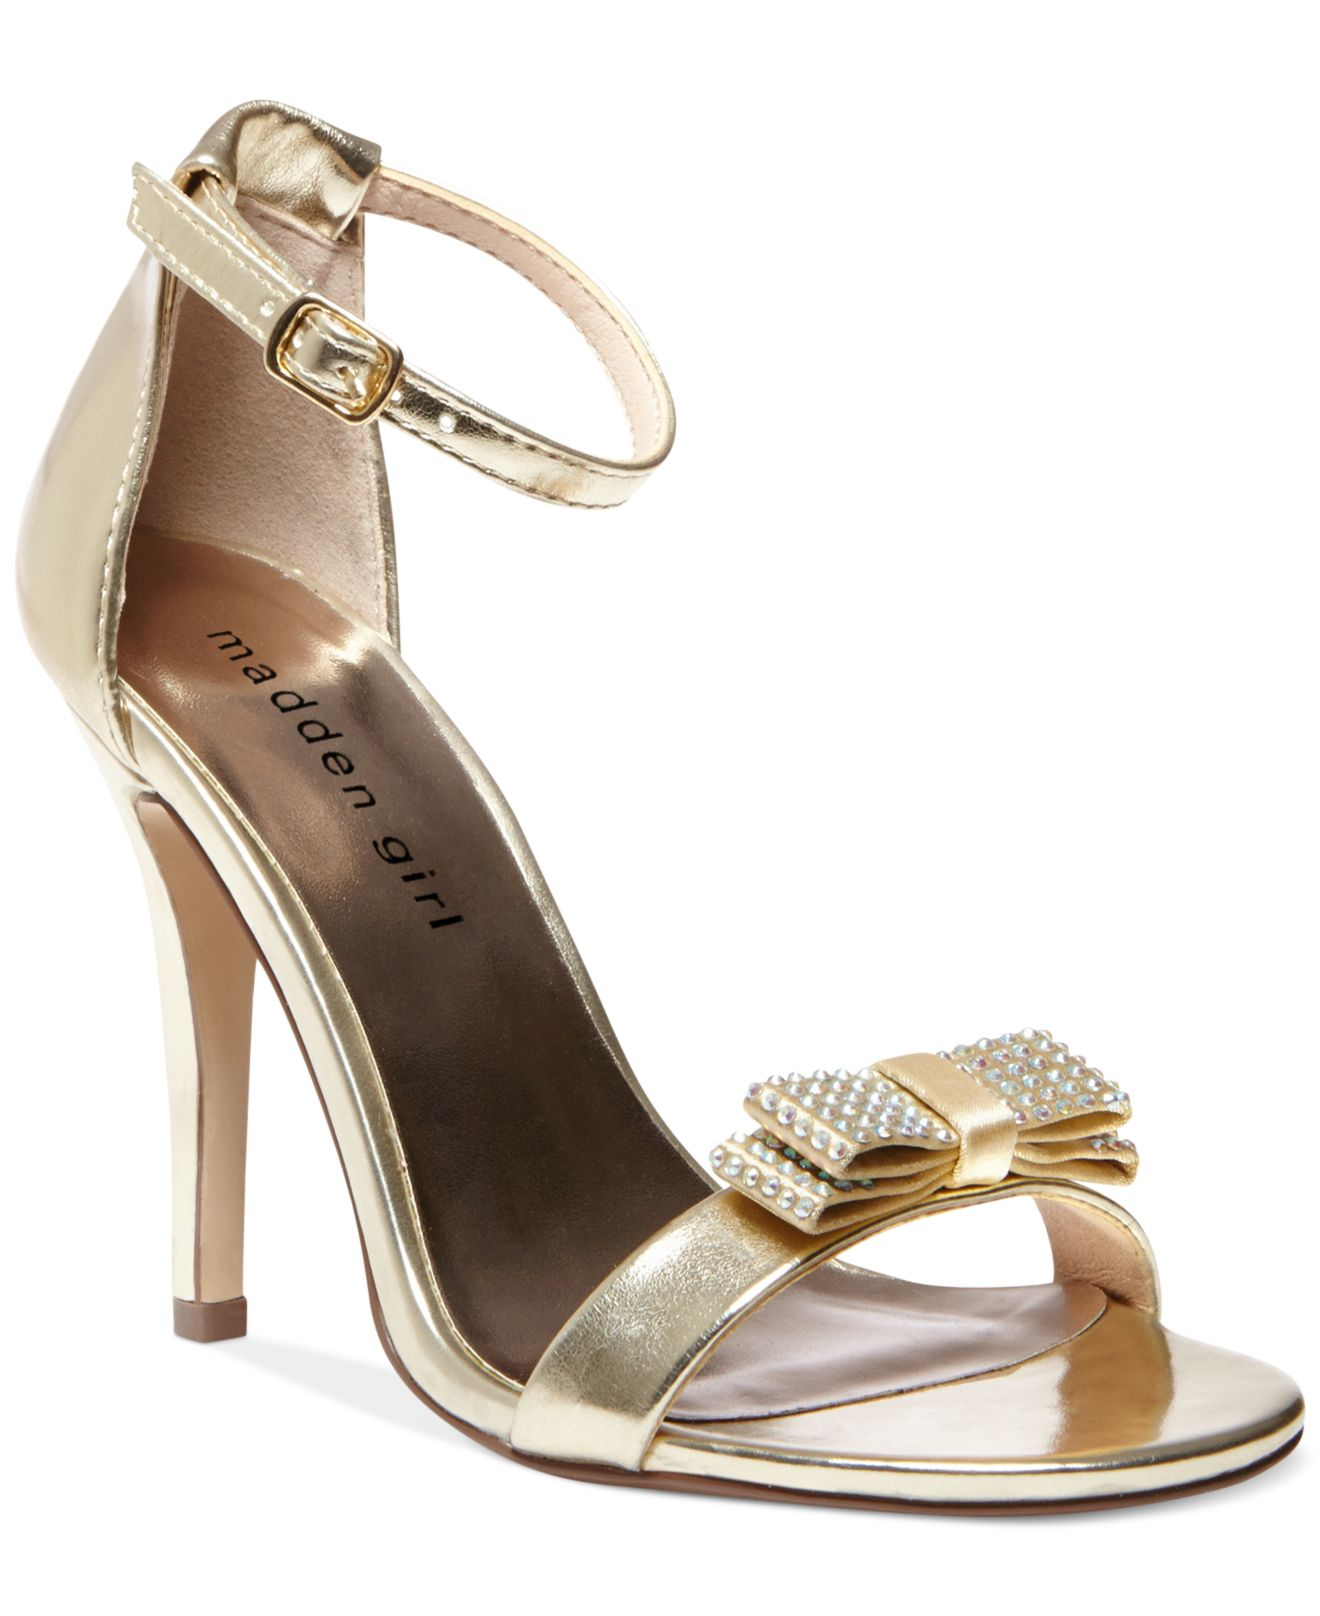 7ae14bfdb Lyst - Madden Girl Darlaaa Rhinestone Bow Dress Sandals in Metallic